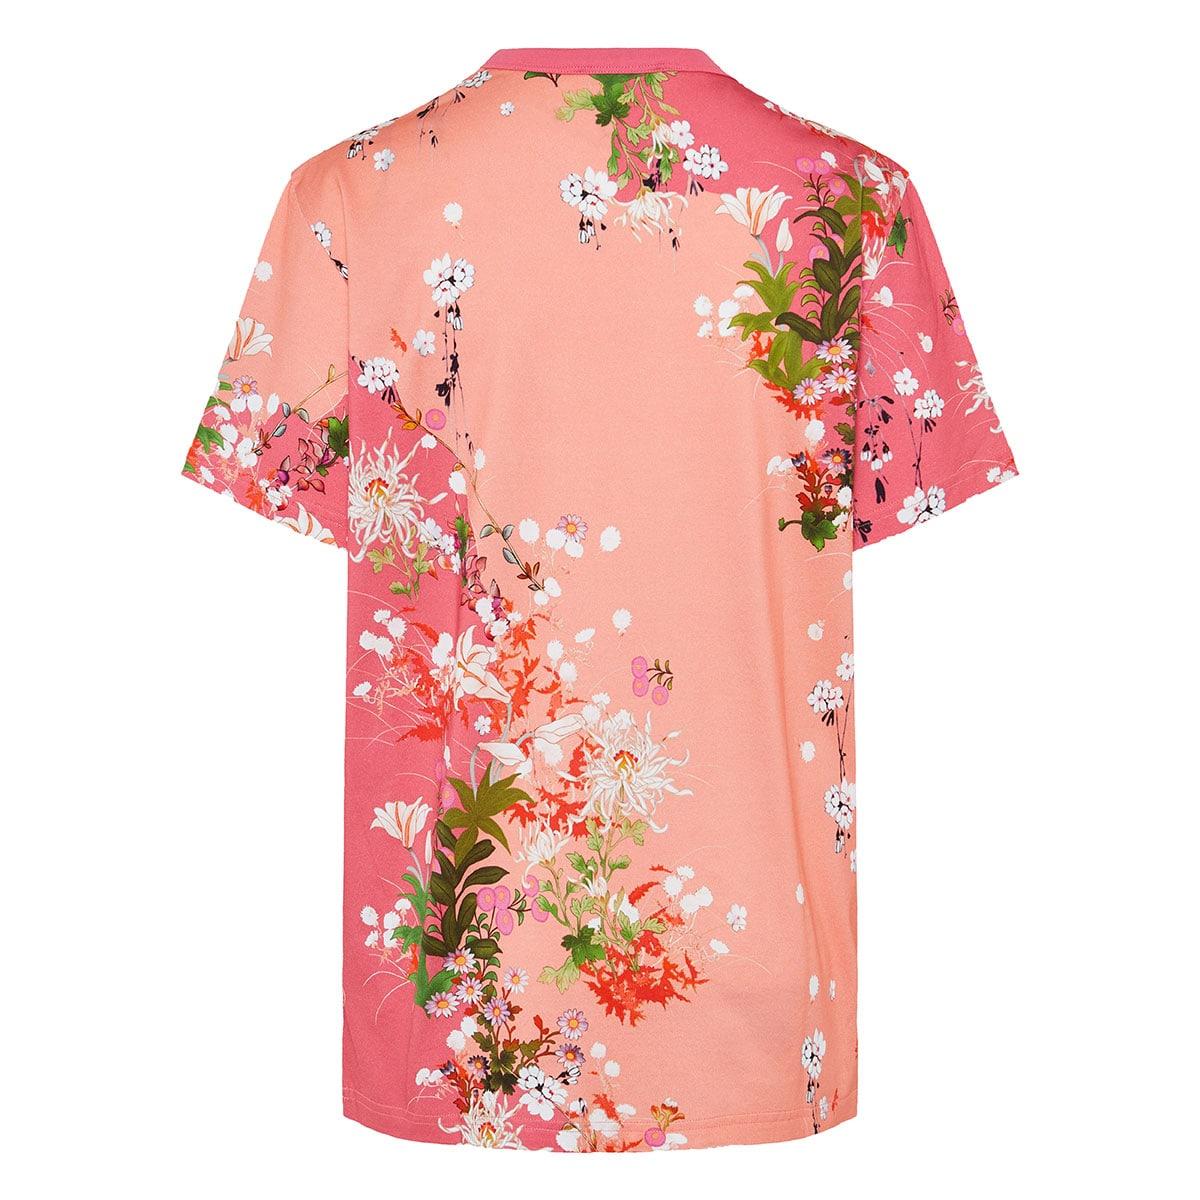 Oversized floral logo t-shirt